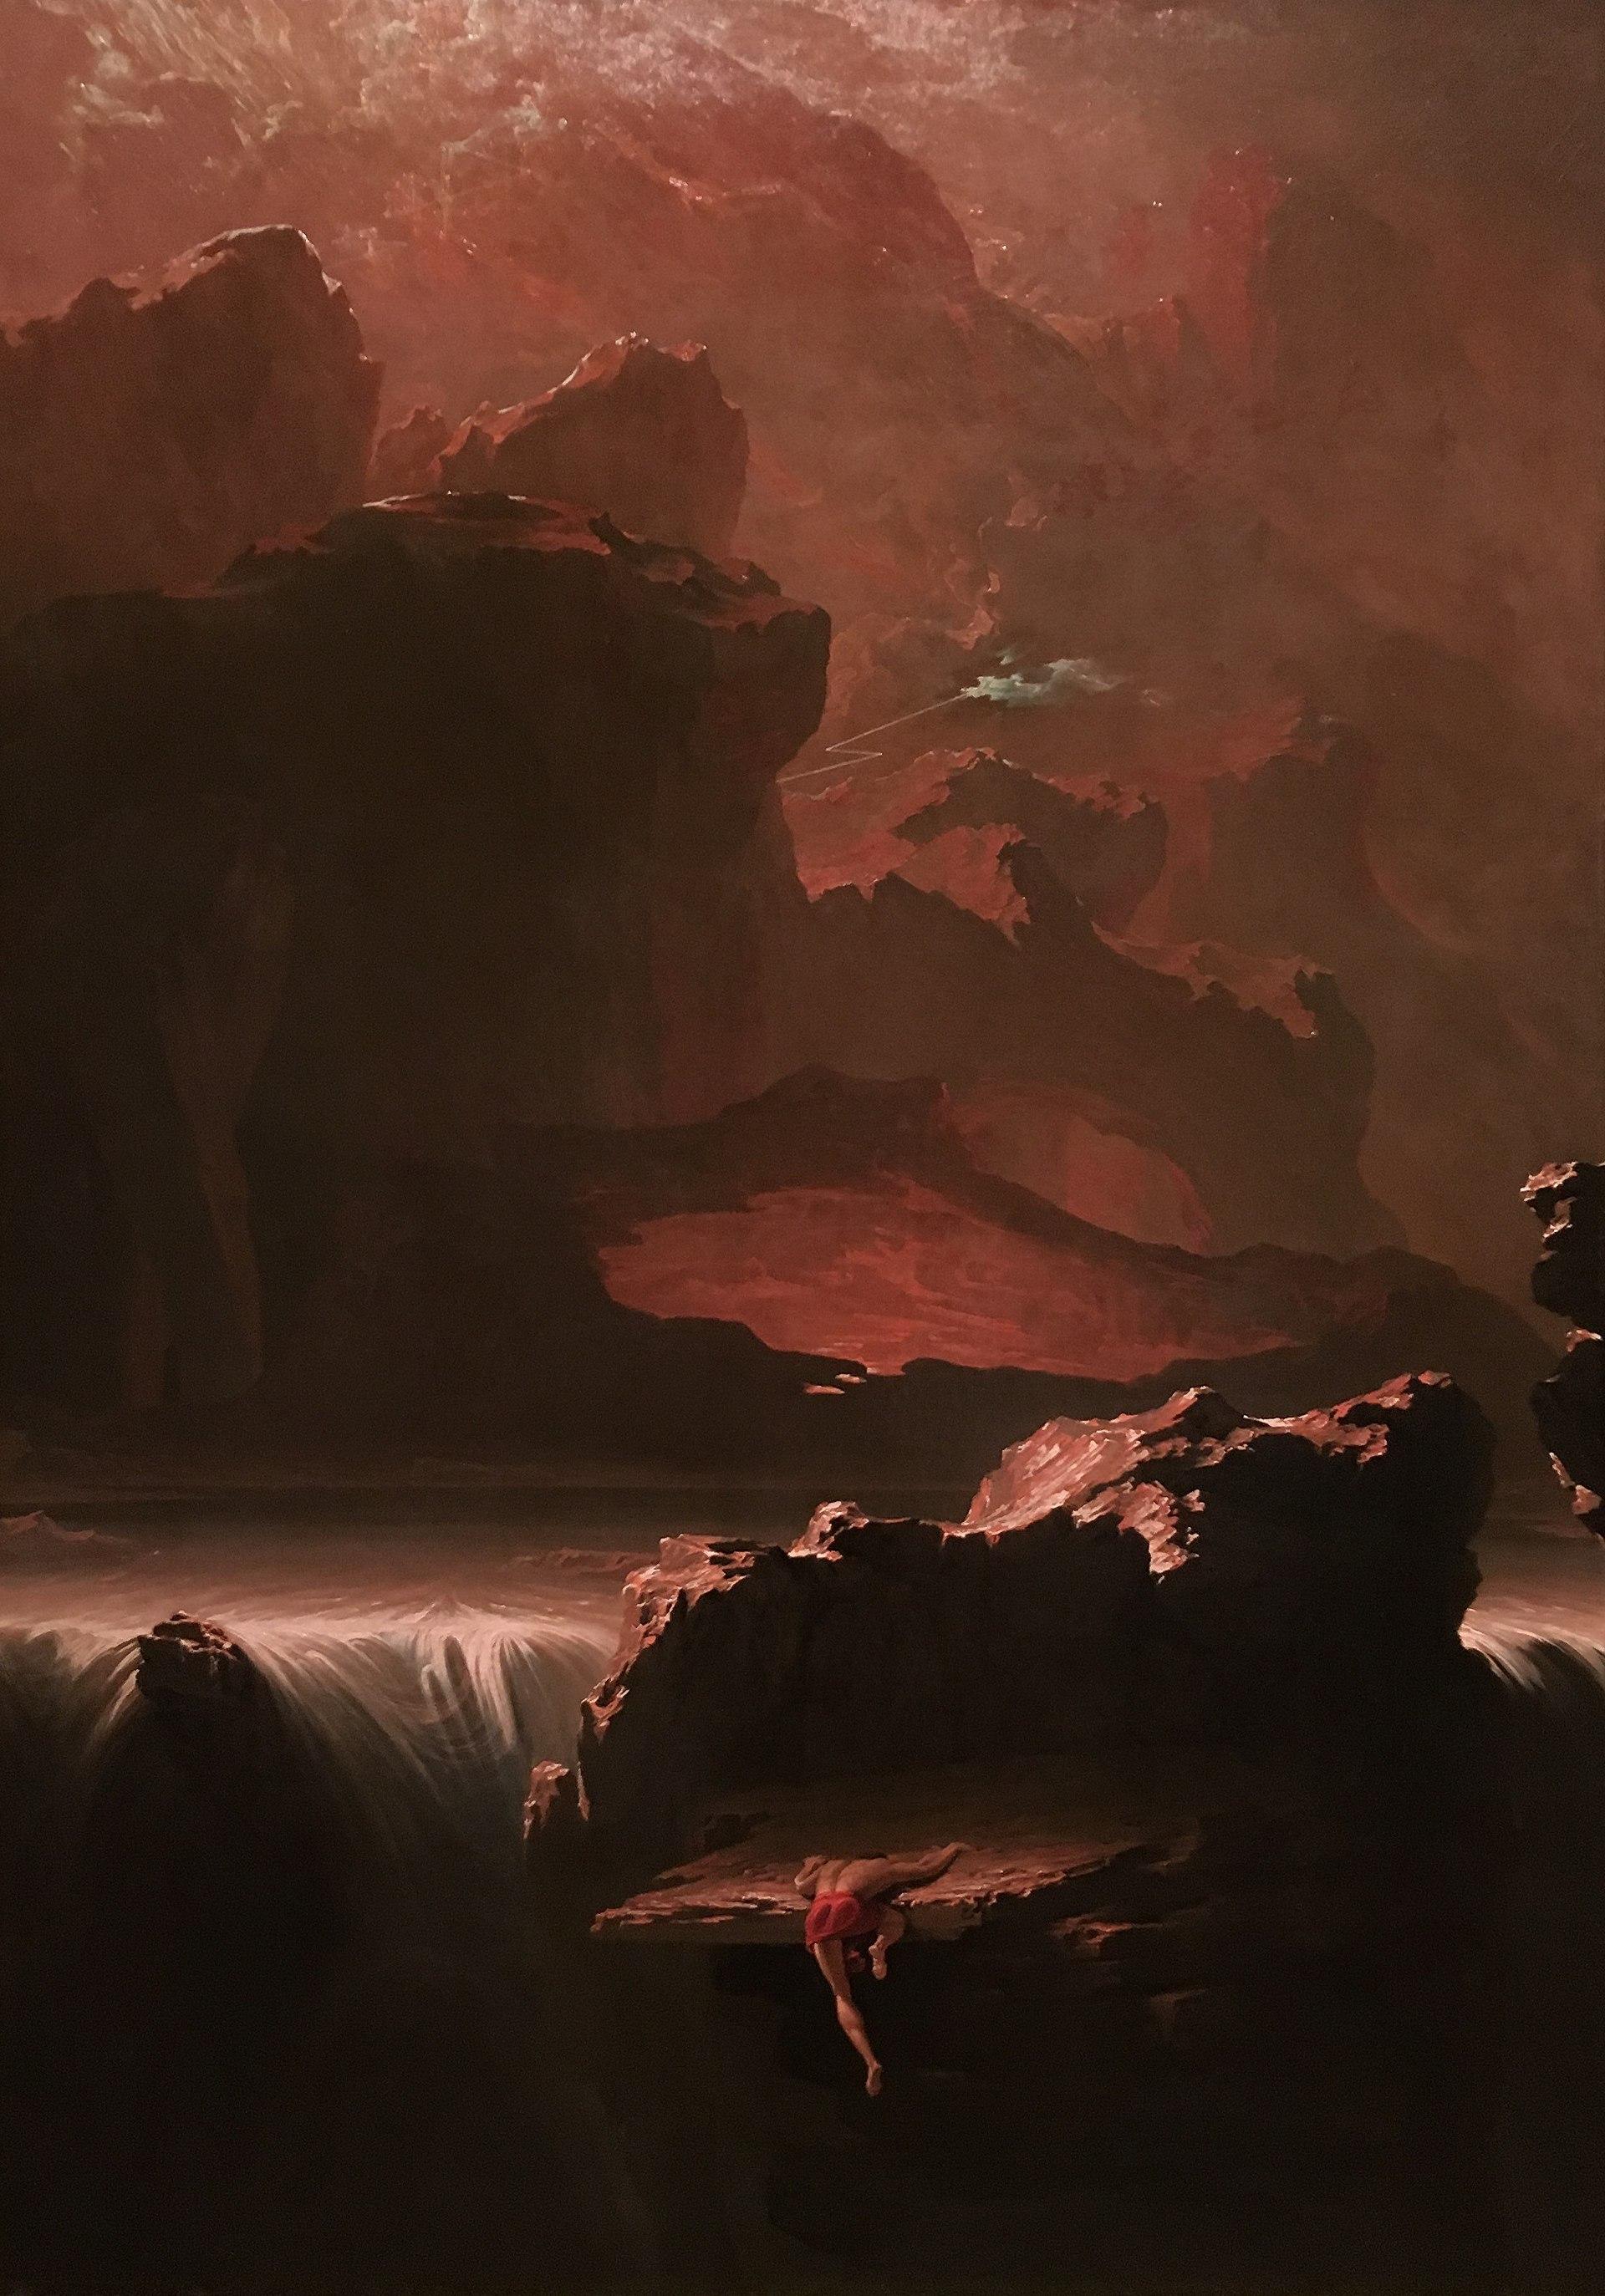 Sadak in Search of the Waters of Oblivion - Wikipedia